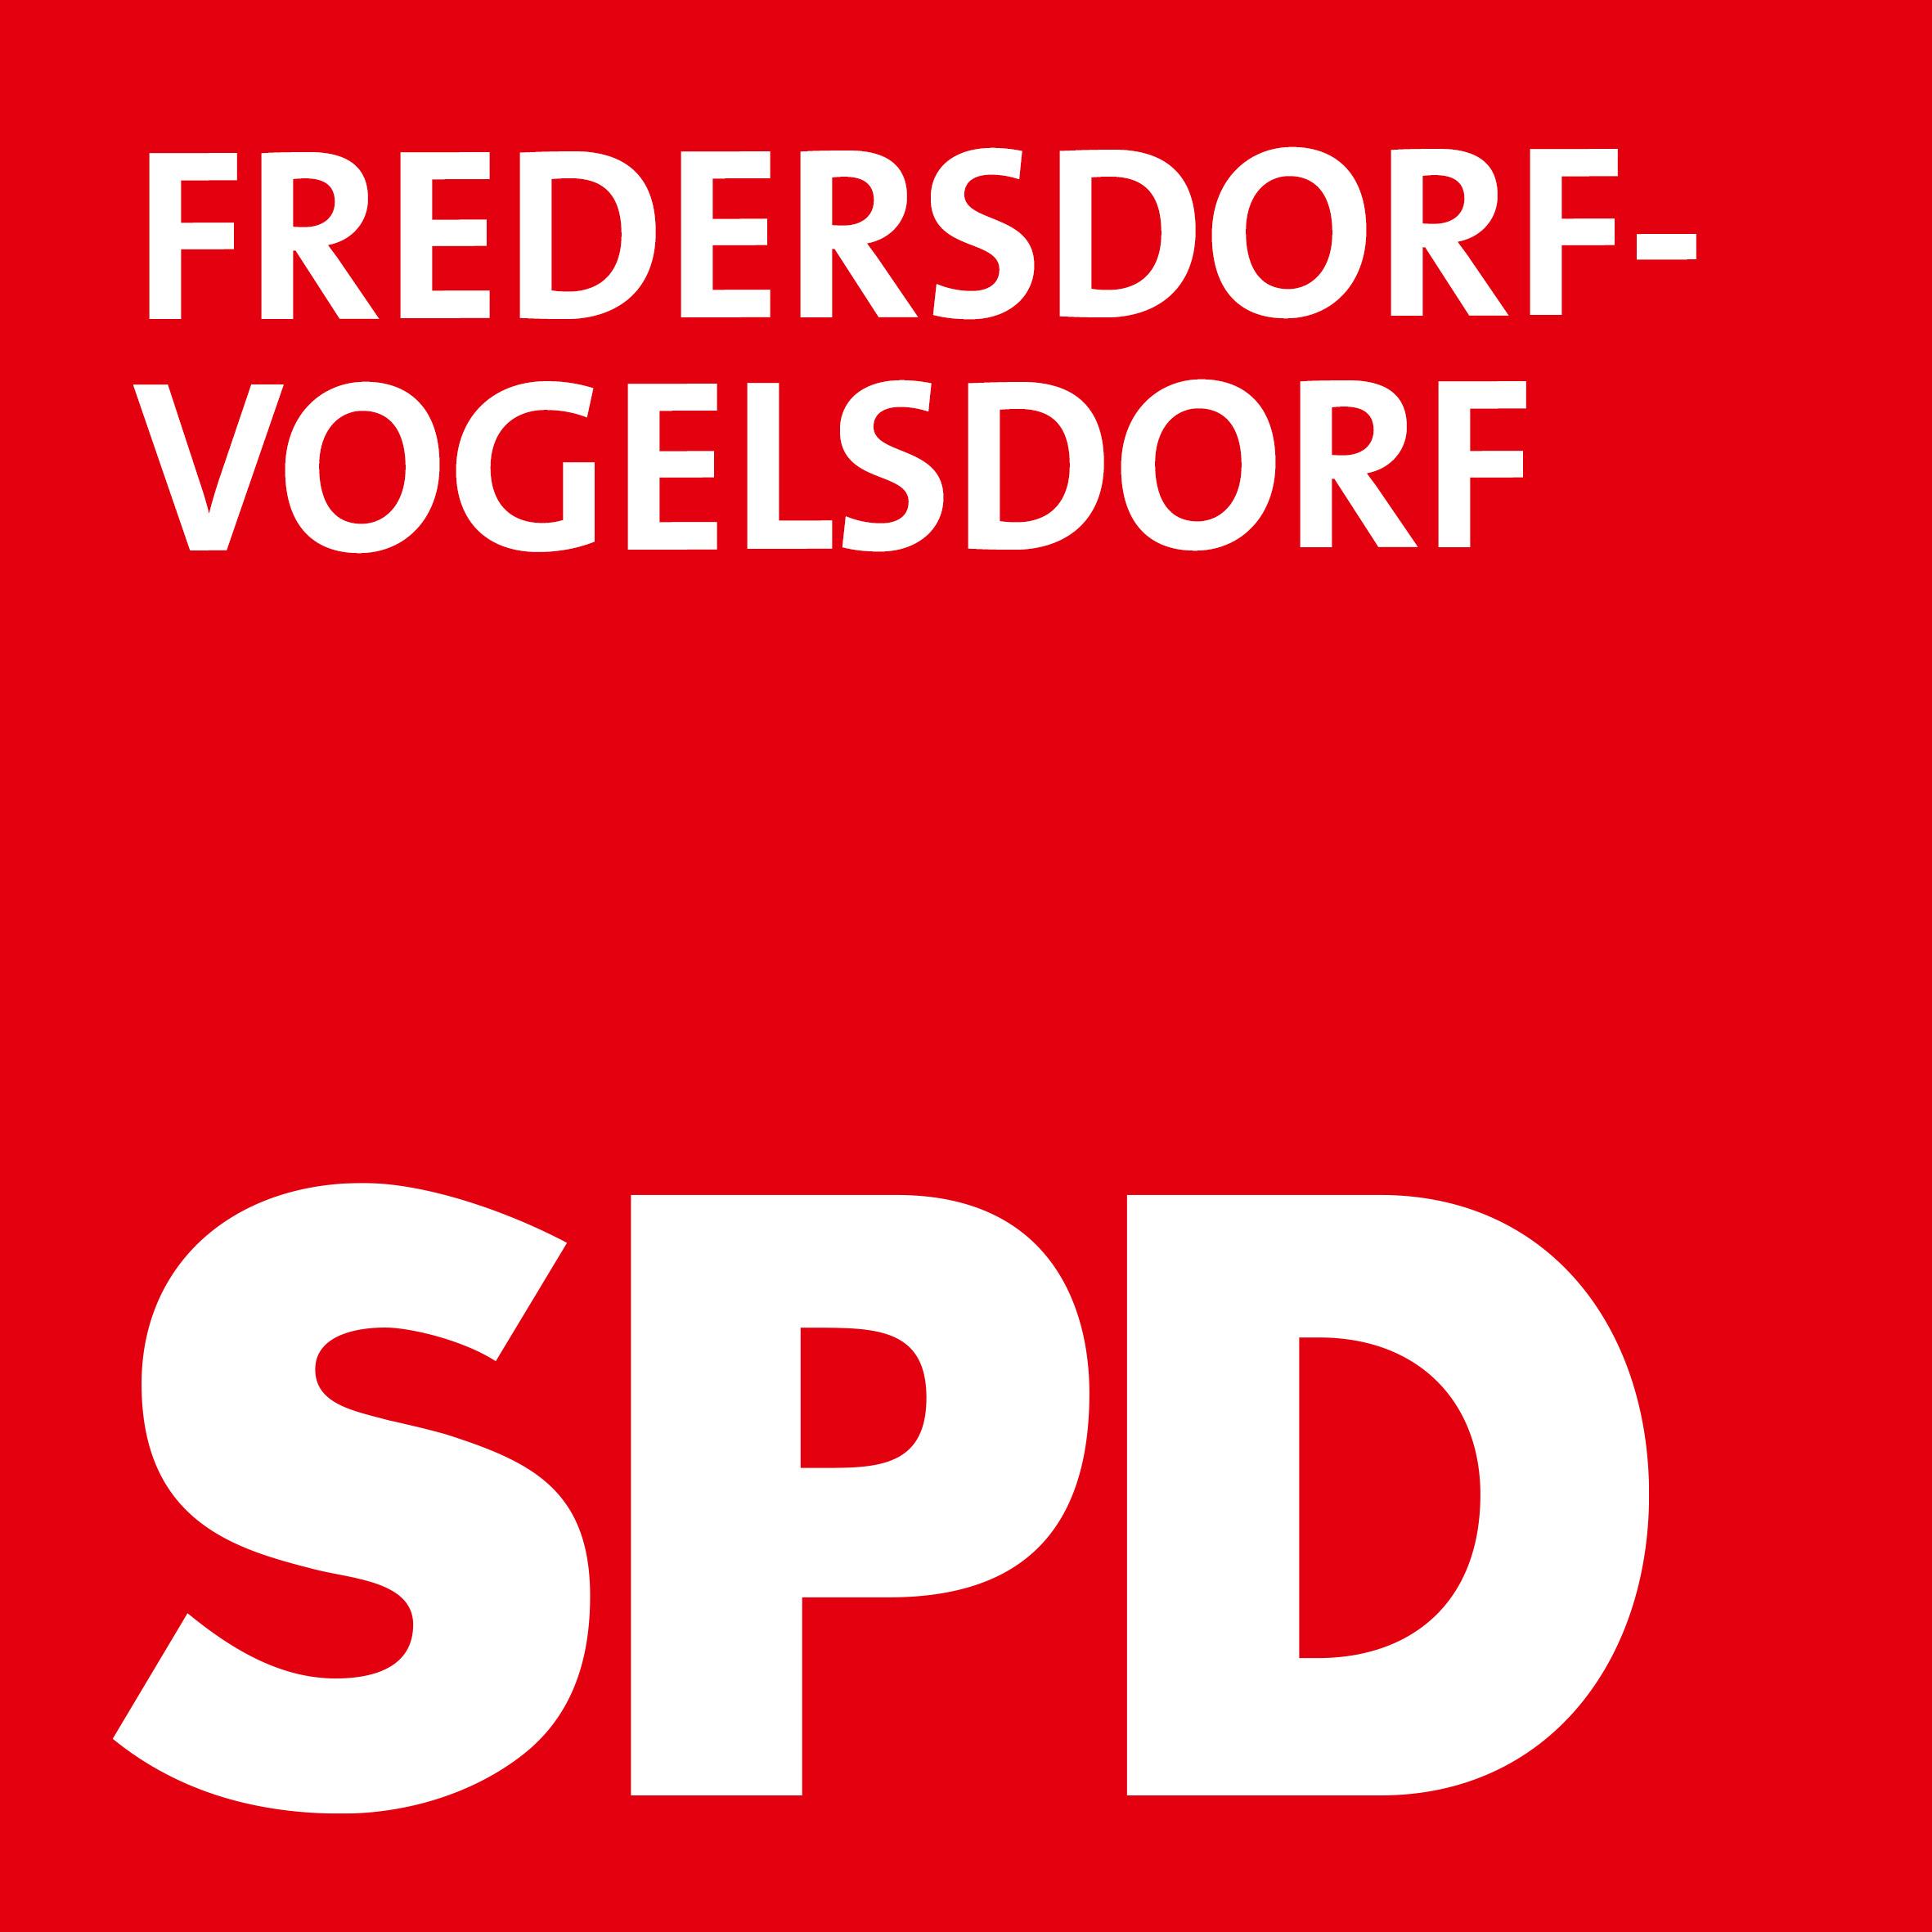 SPD Fredersdorf-Vogelsdorf